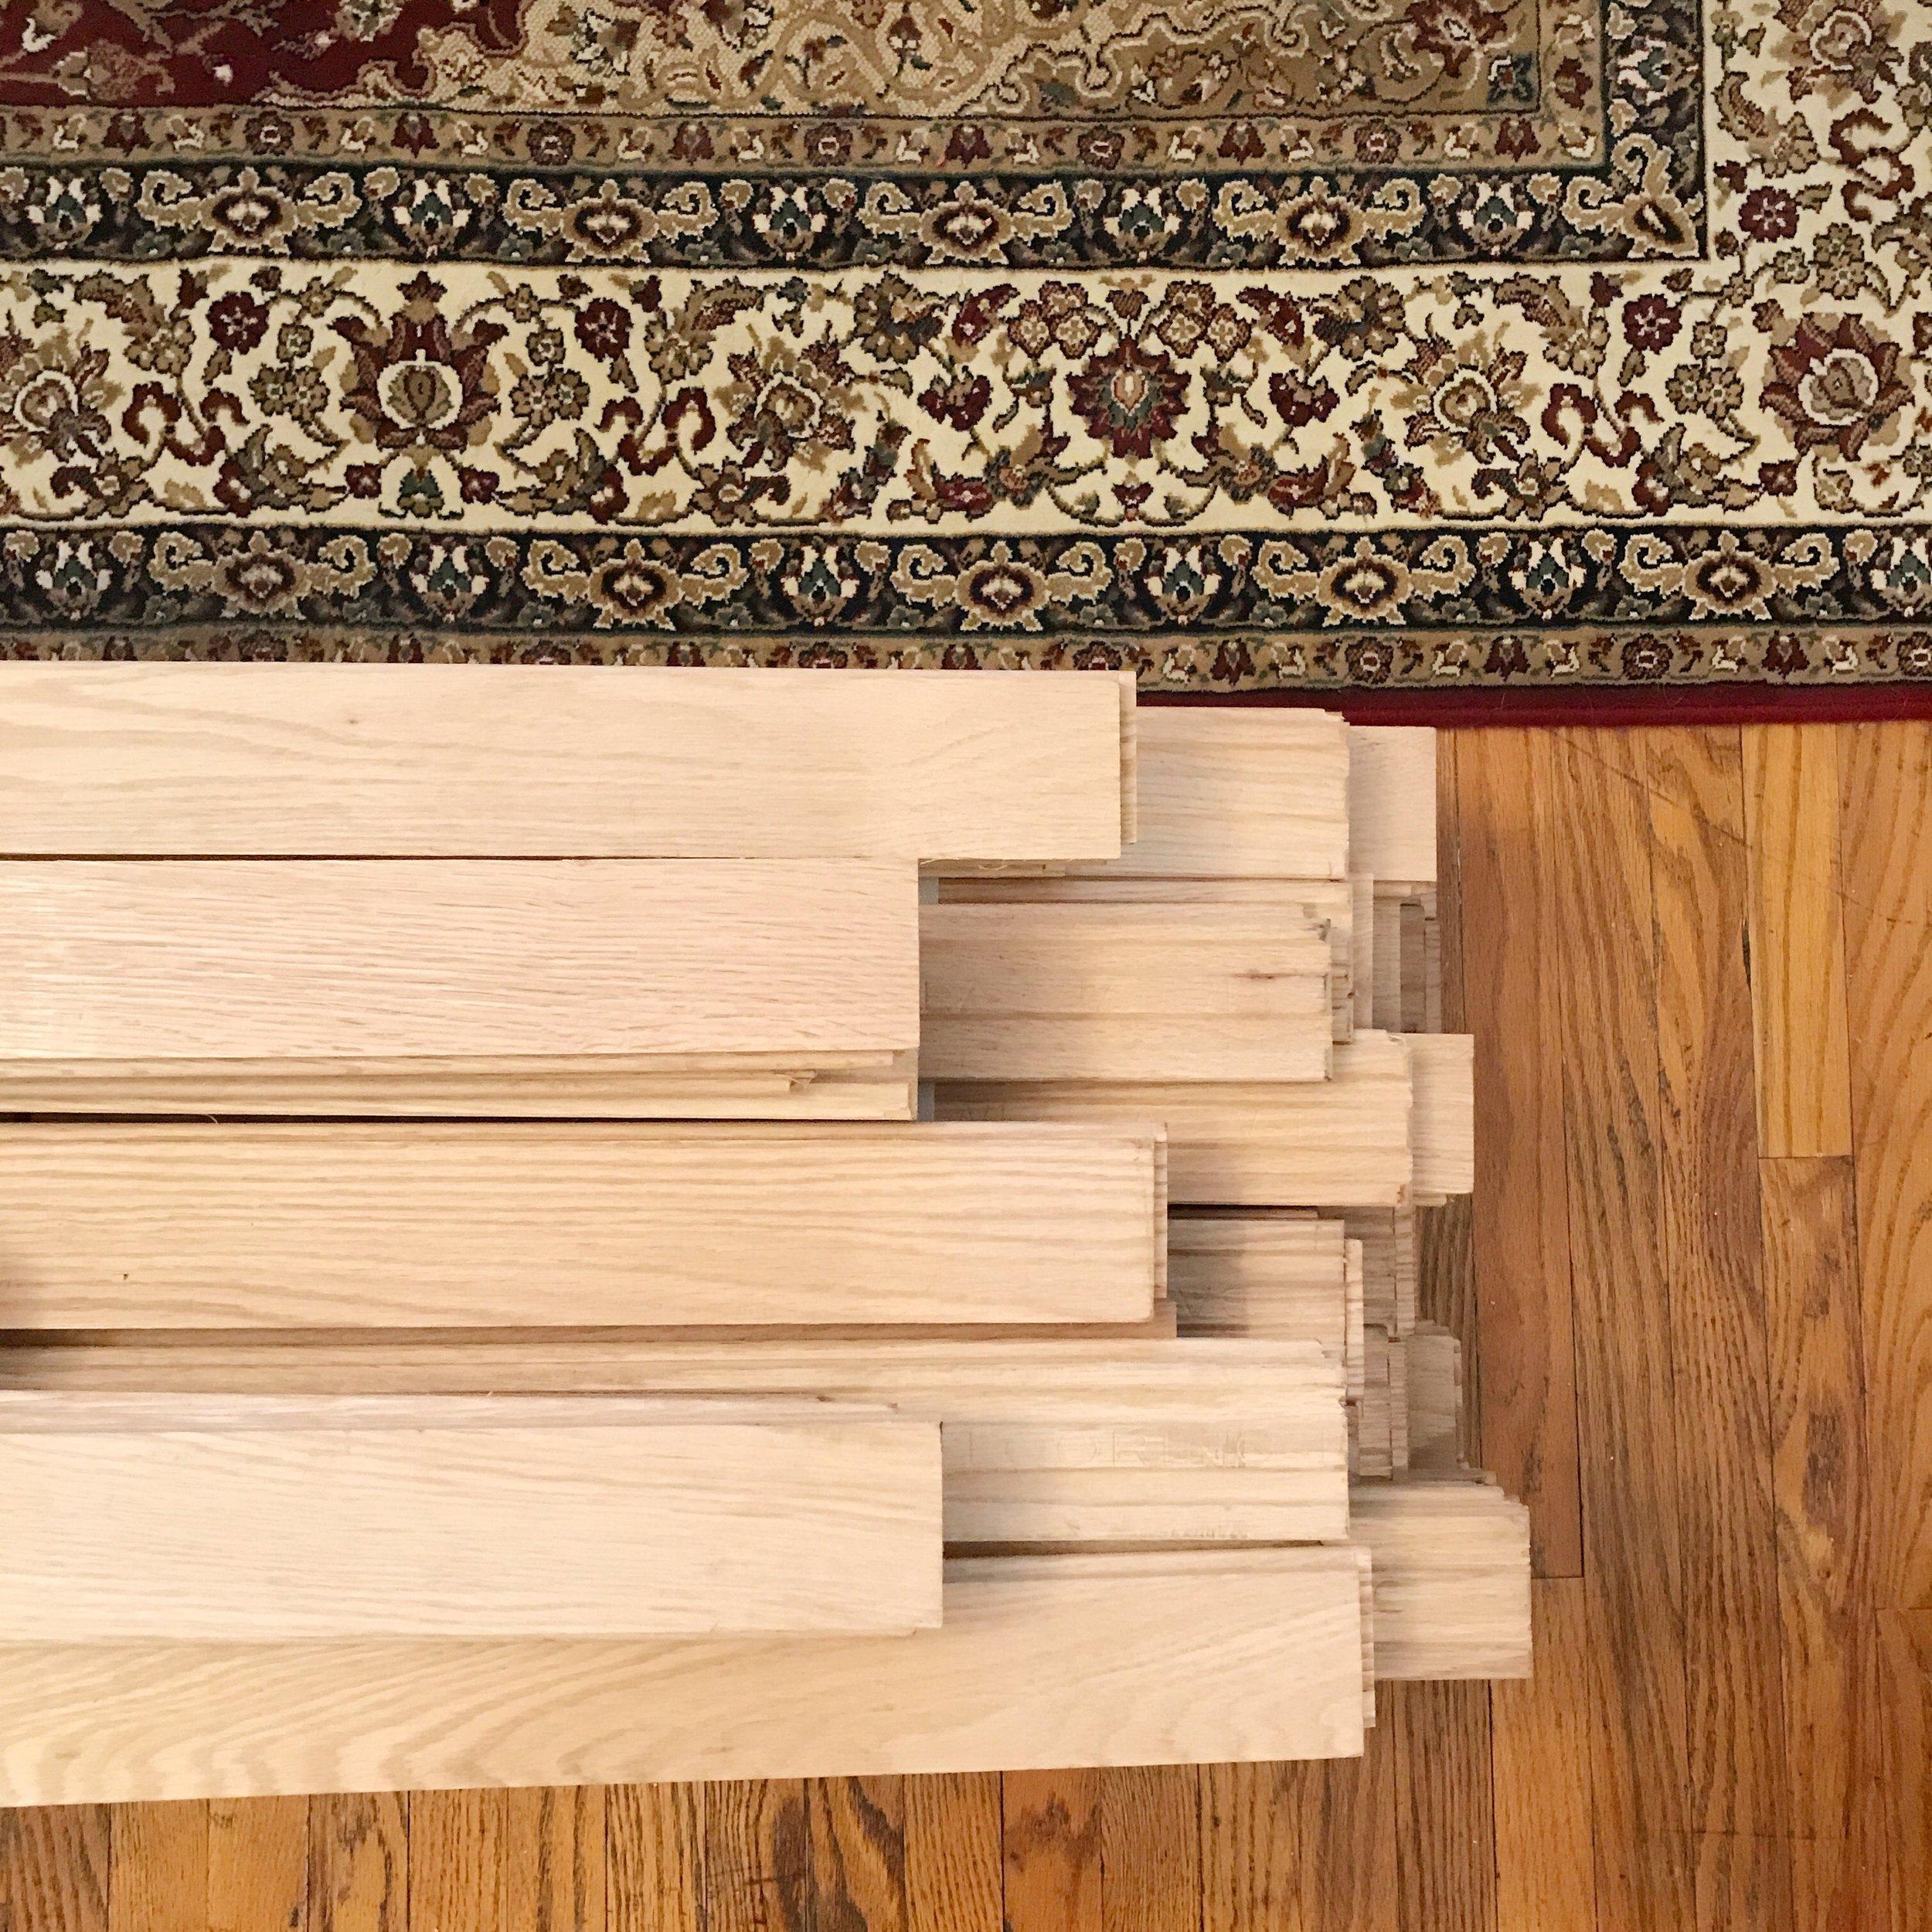 hardwood-flooring-and-persian-rug.JPG